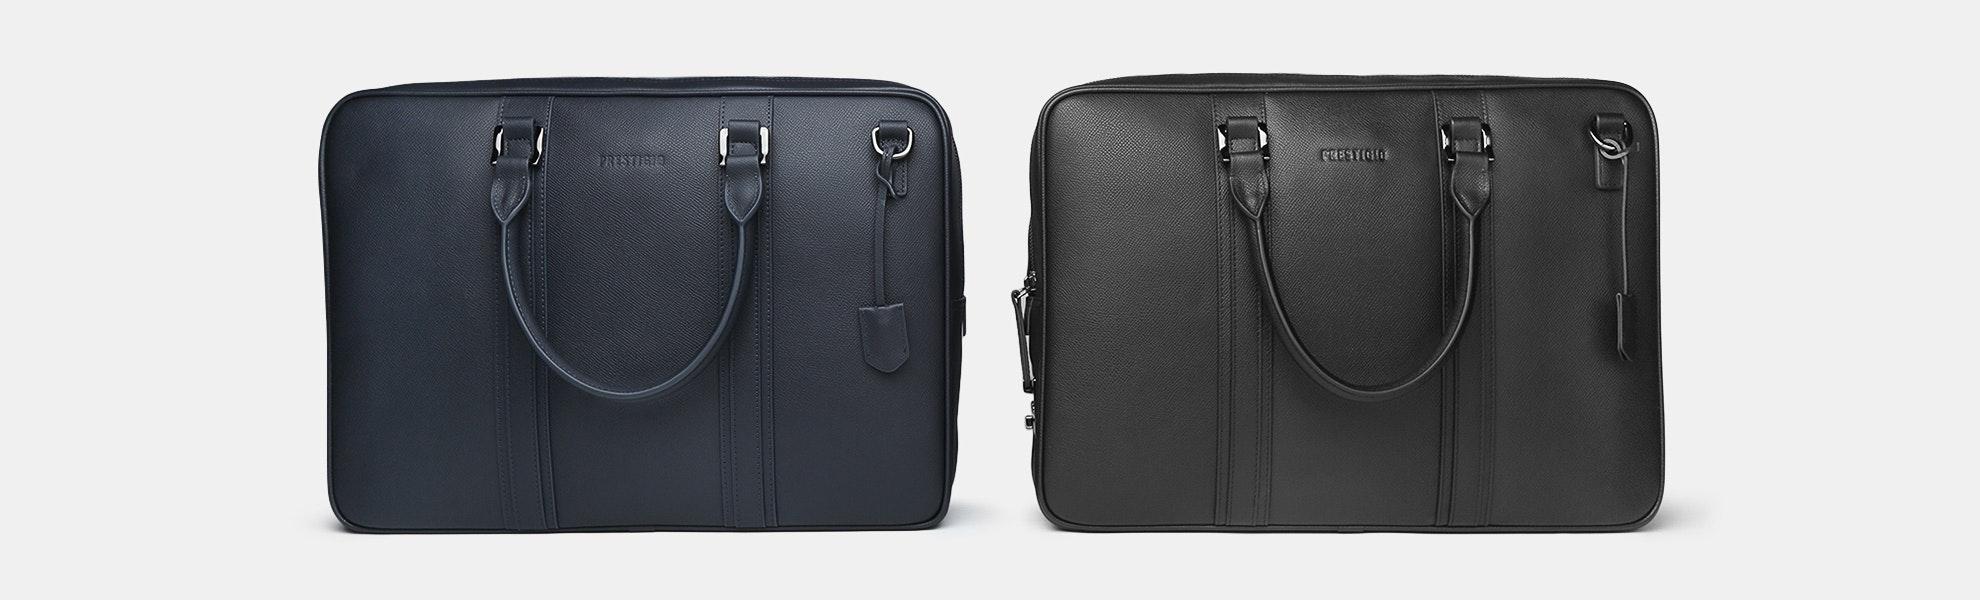 Prestigio Executive Bag